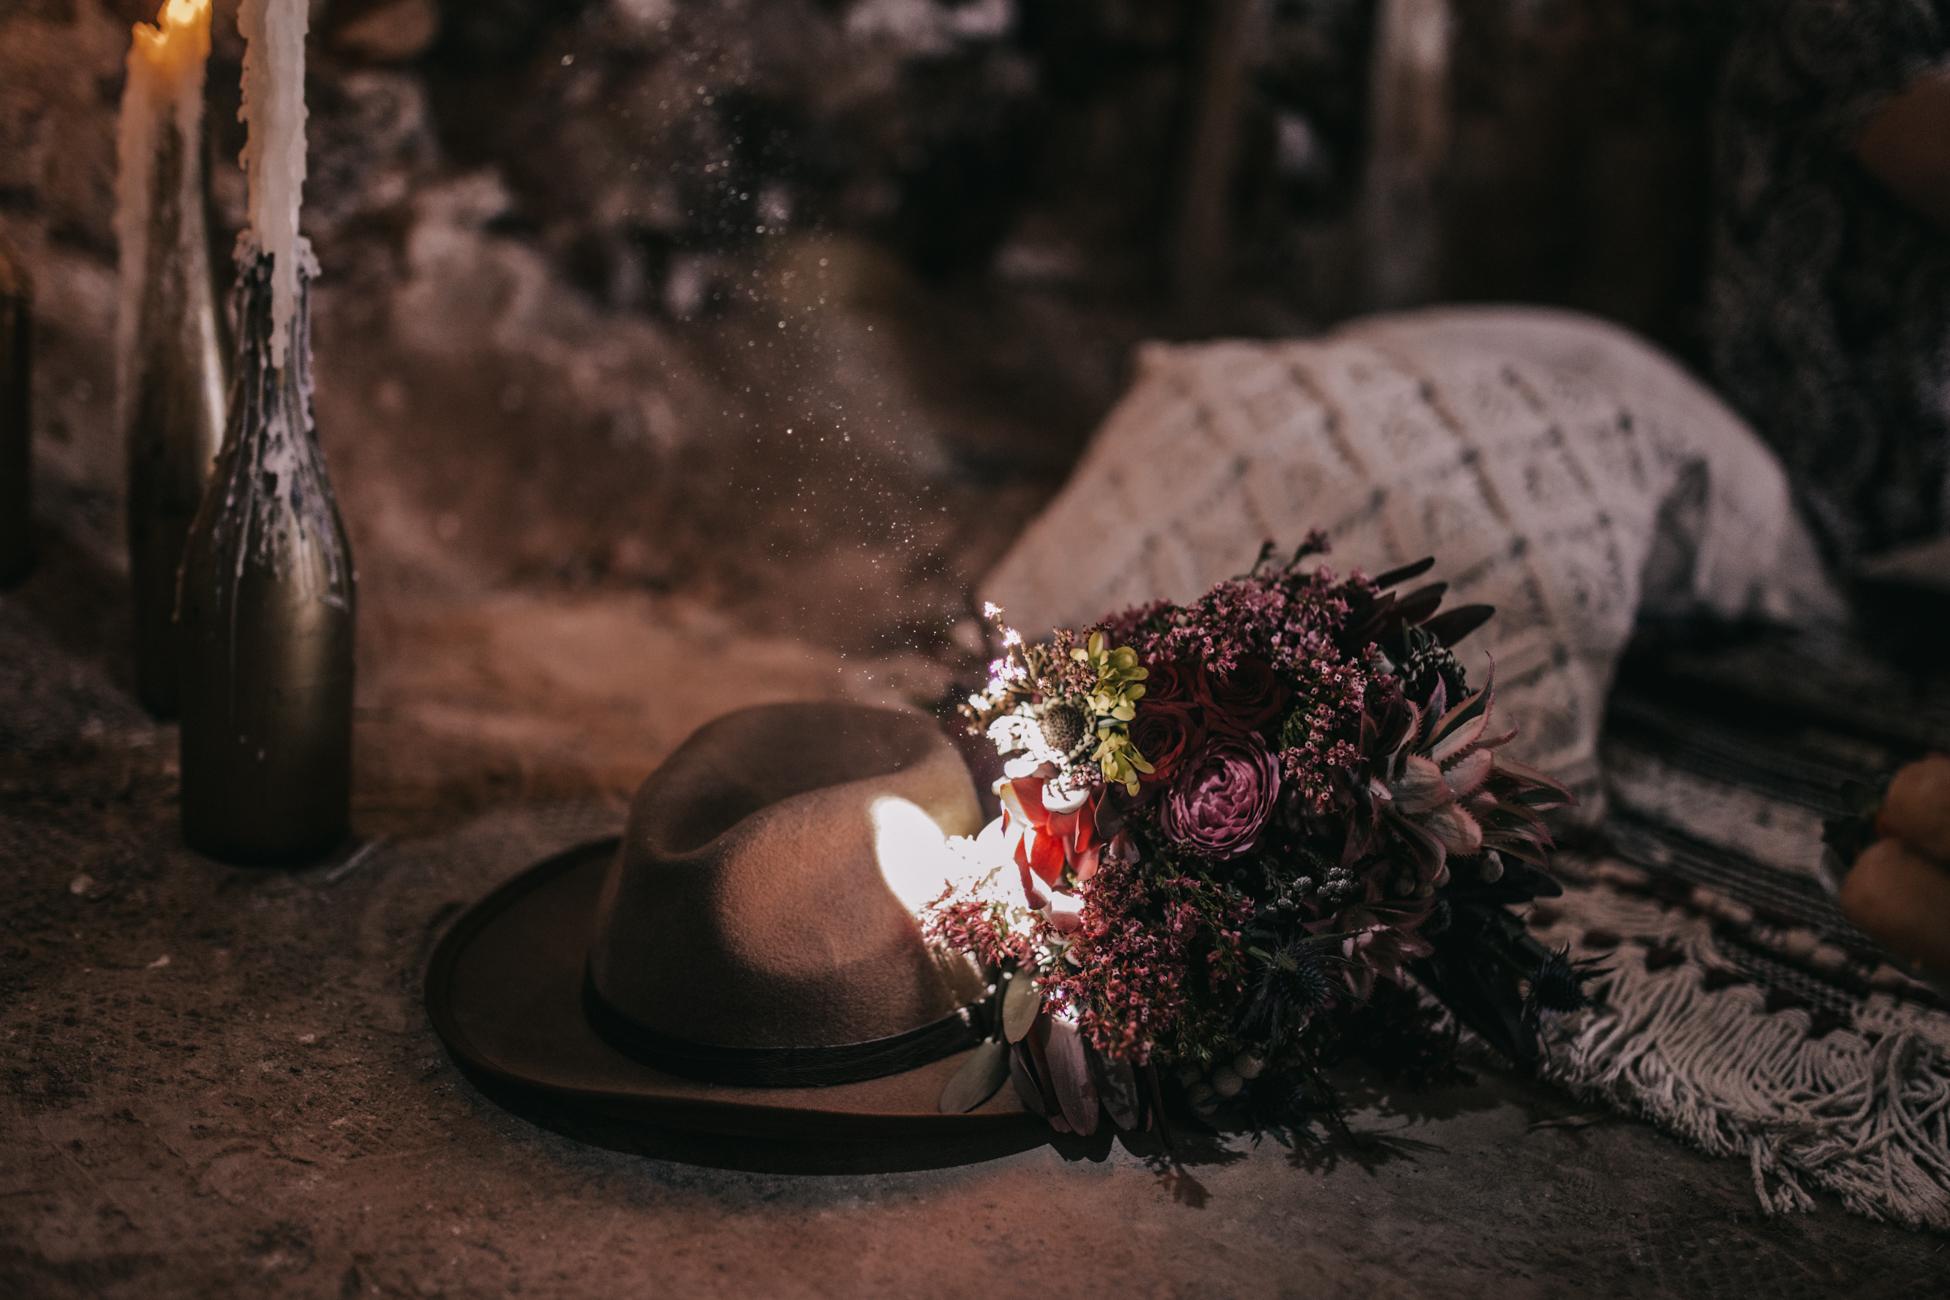 thenortherngirlphotography_photography_thenortherngirl_rebeccascabros_wedding_weddingphotography_weddingphotographer_wood_muebles_deco_bodasdecaramelo_home_bedtime_gaywedding_editorial_desierto_desert_wildestdreams_amortexano-112.jpg